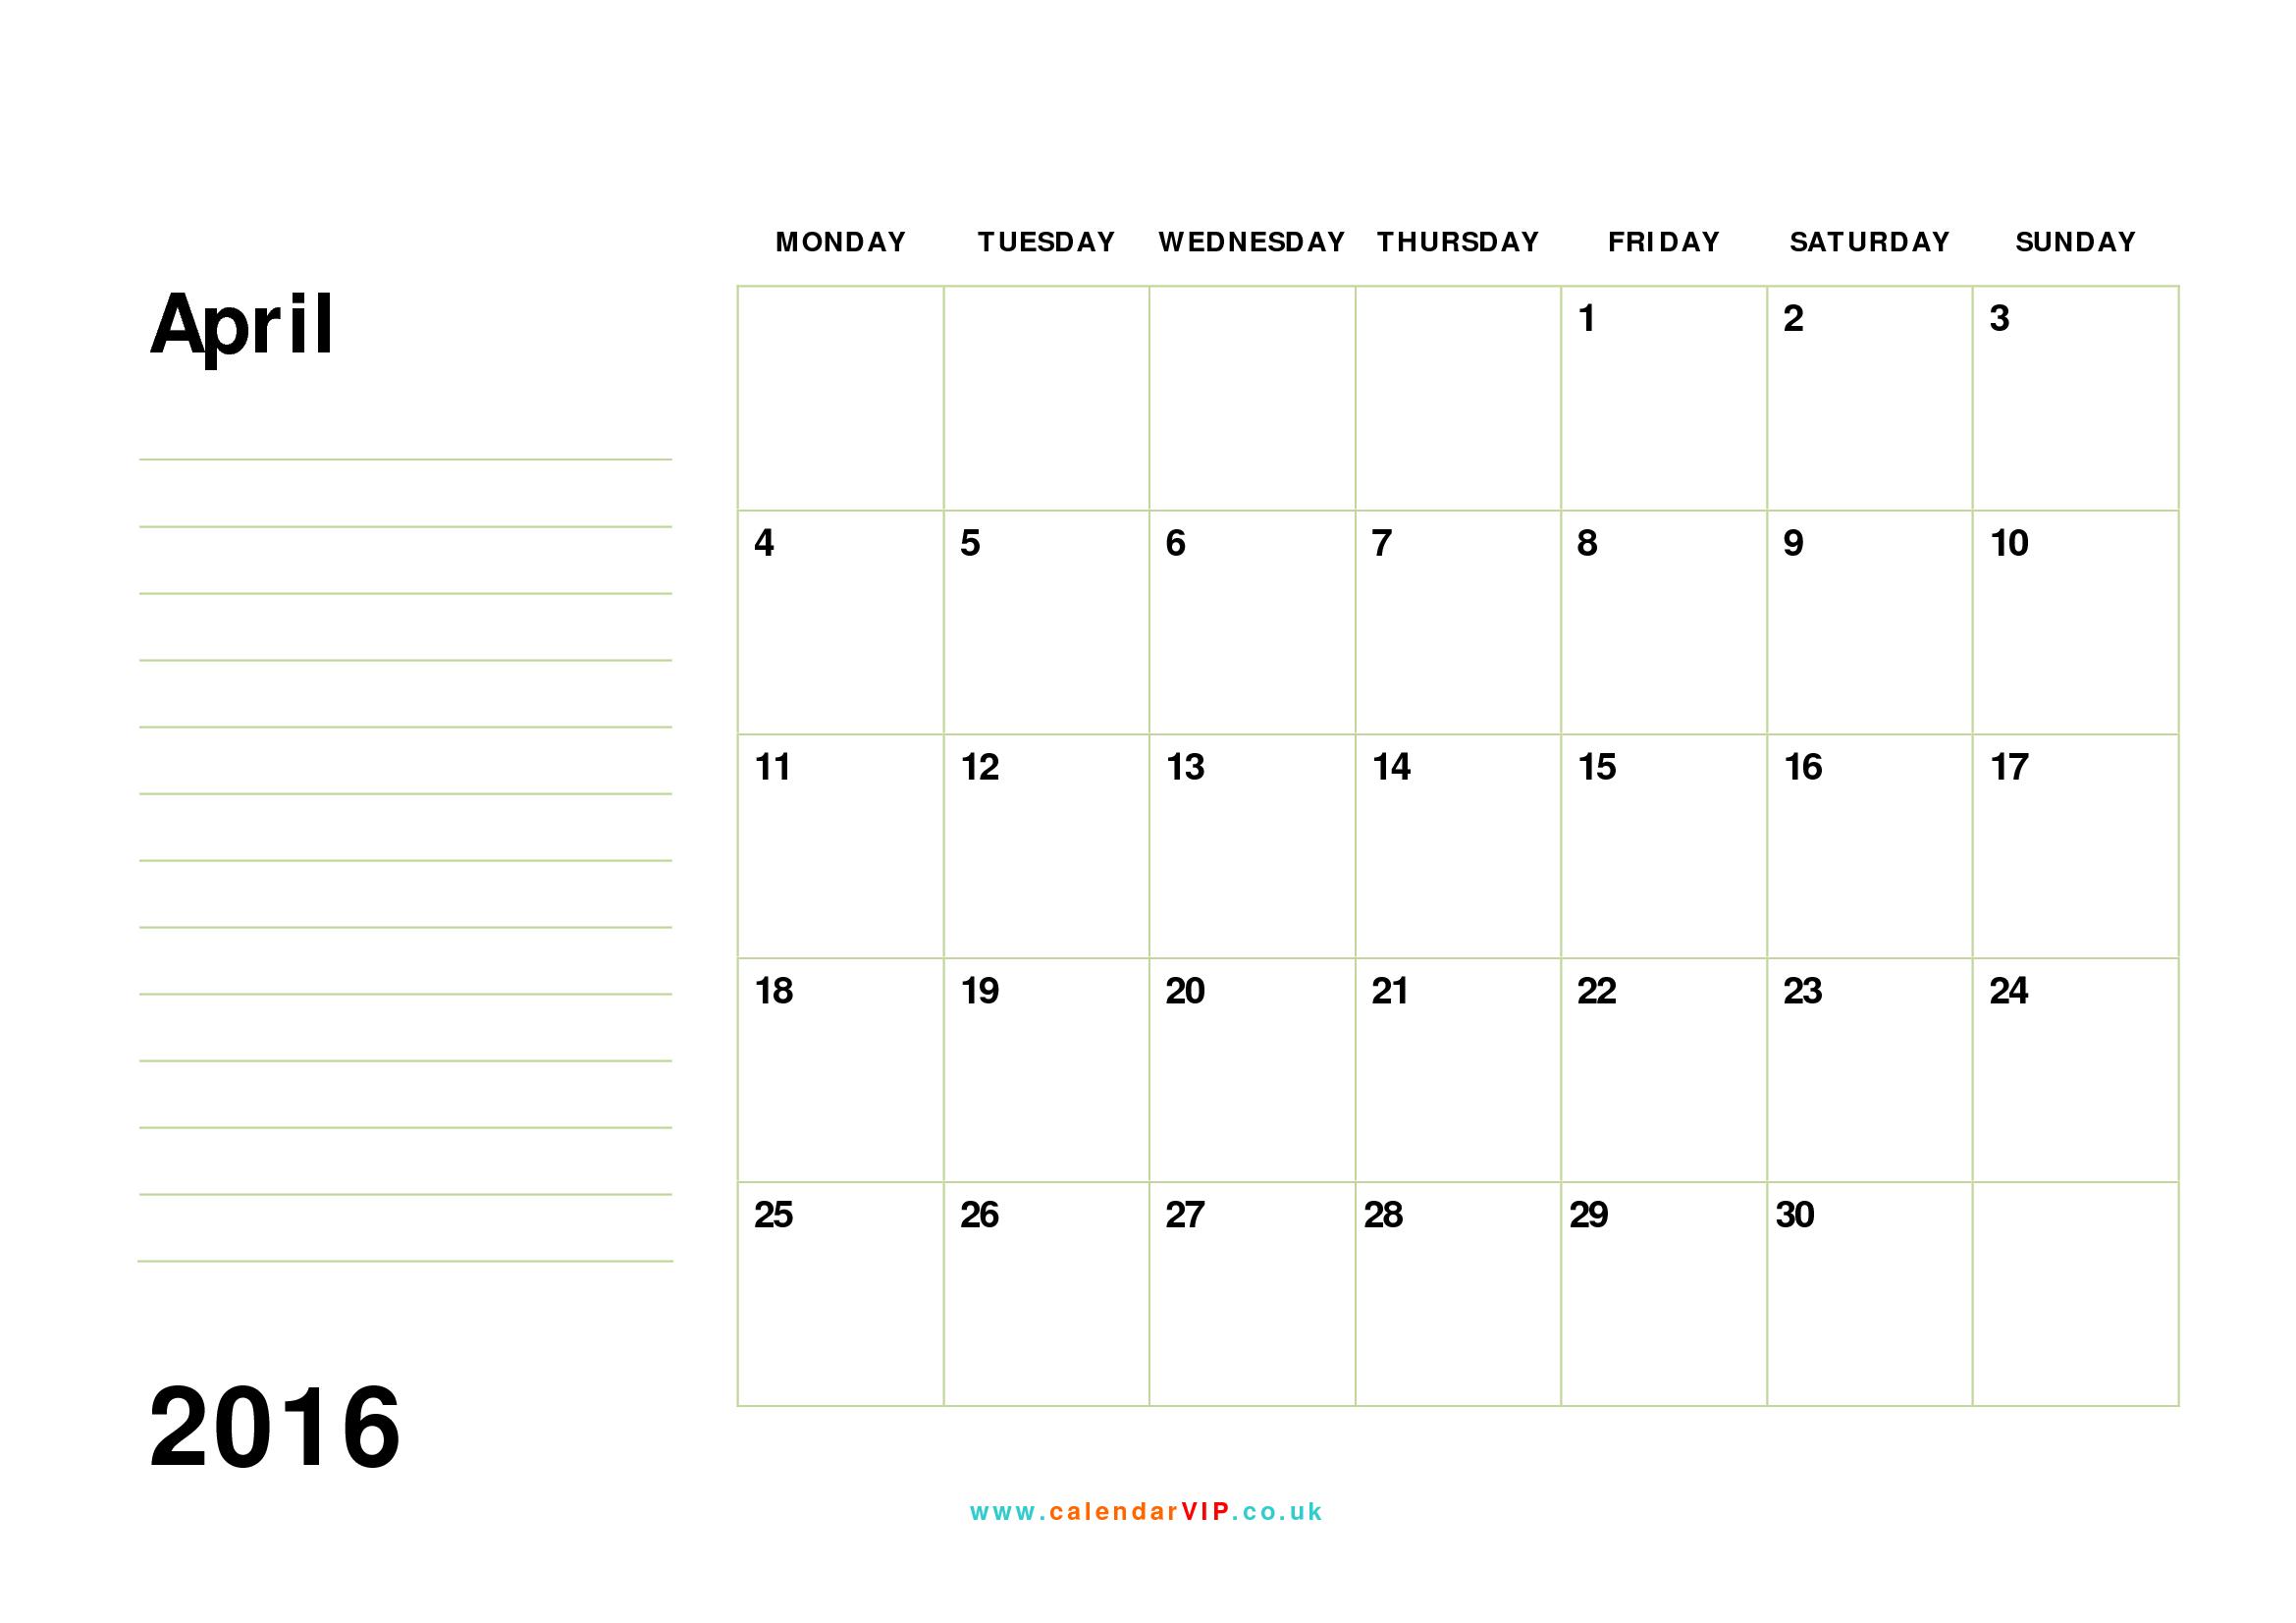 April 2016 Calendar Free Monthly Calendar Templates for UK